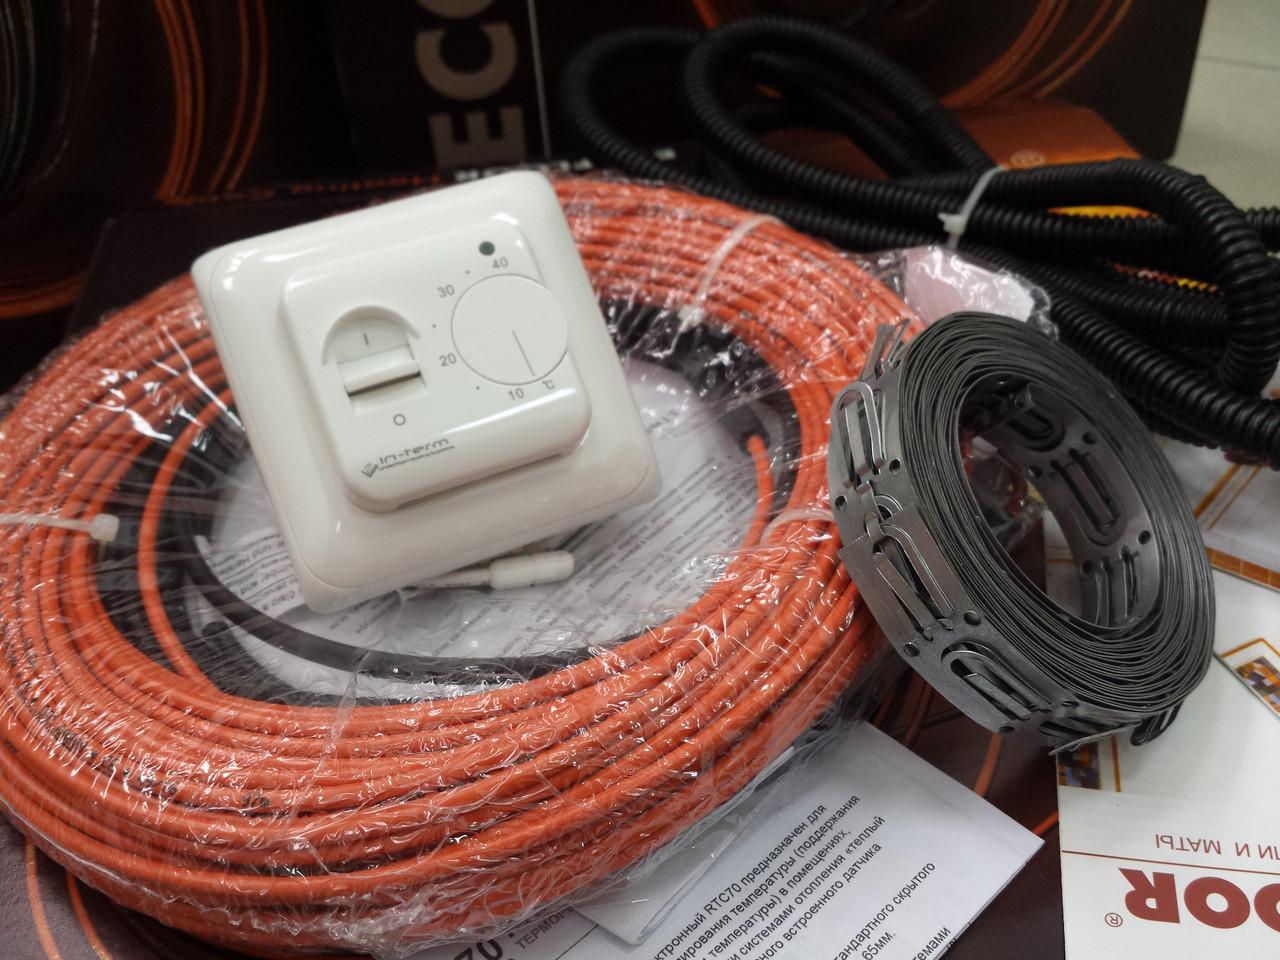 Комплект кабеля Fenix  Adsv18160 (спец акционное предложение)(160 вт)